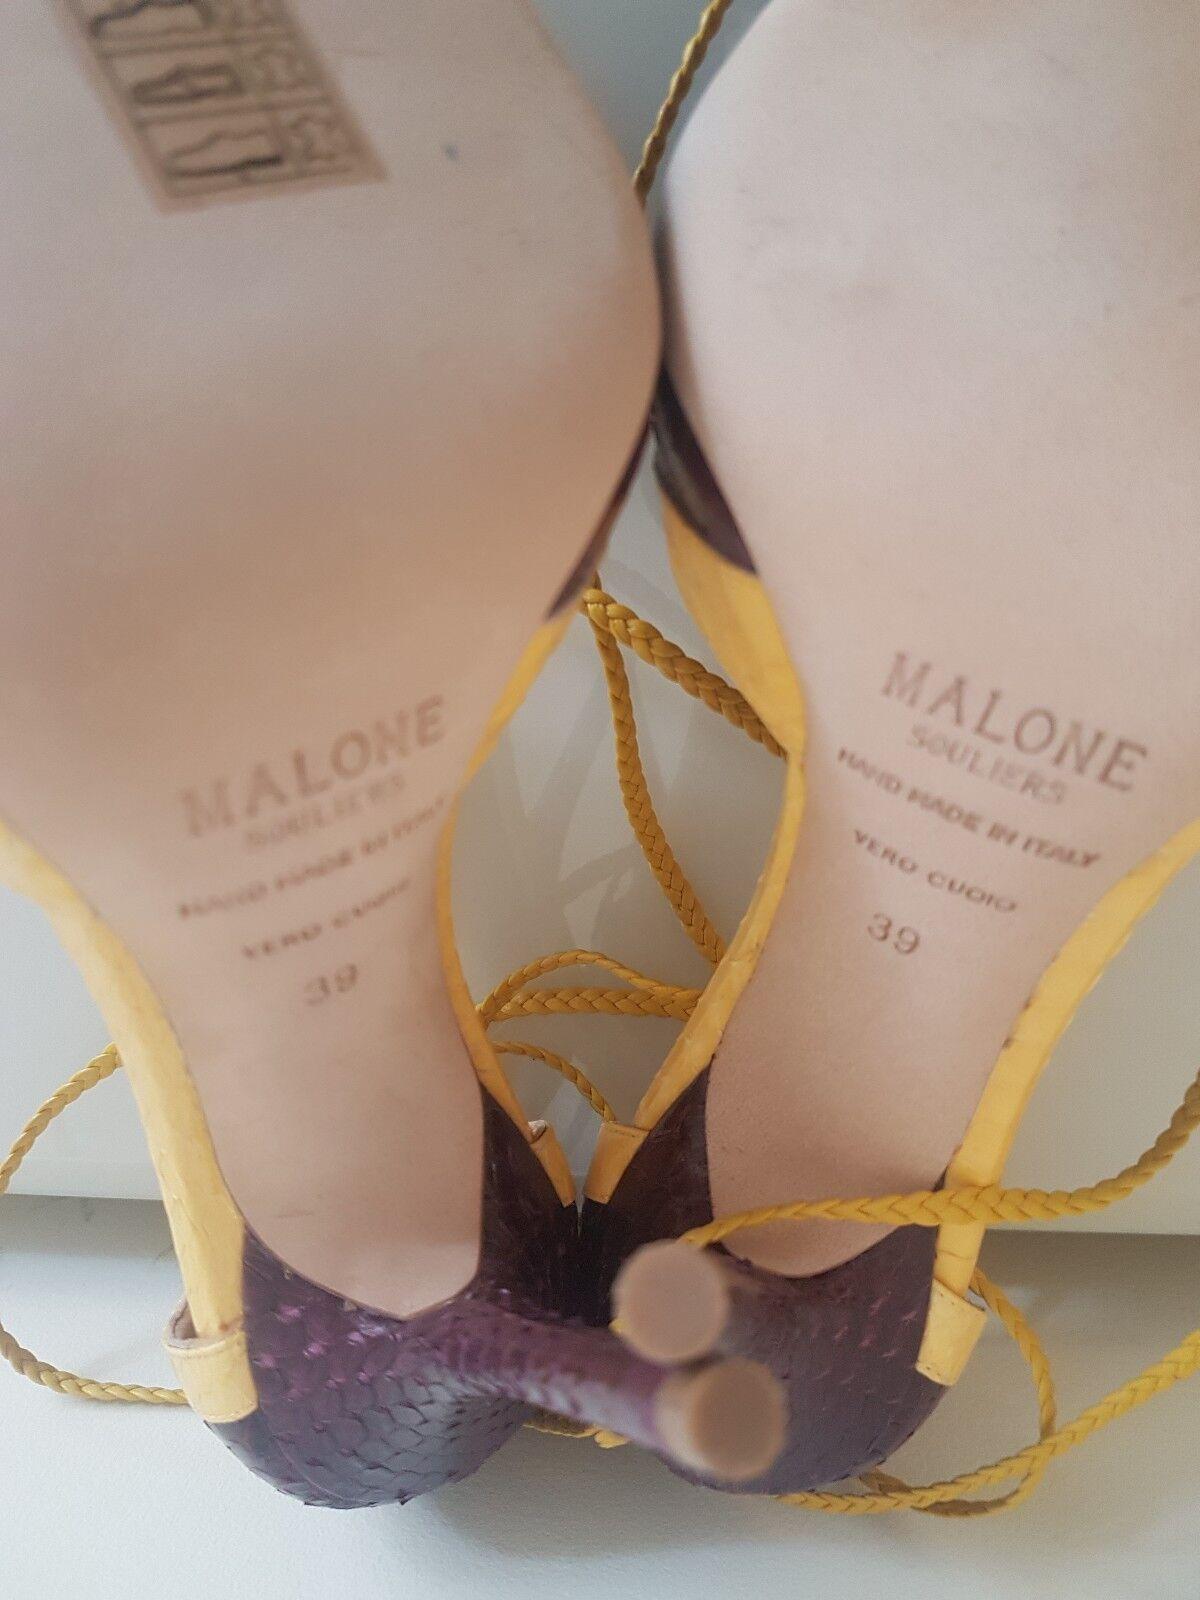 NEW MALONE SOULIERS SOULIERS SOULIERS Haji two-tone watersnake pumps Size UK 6 f9a77d